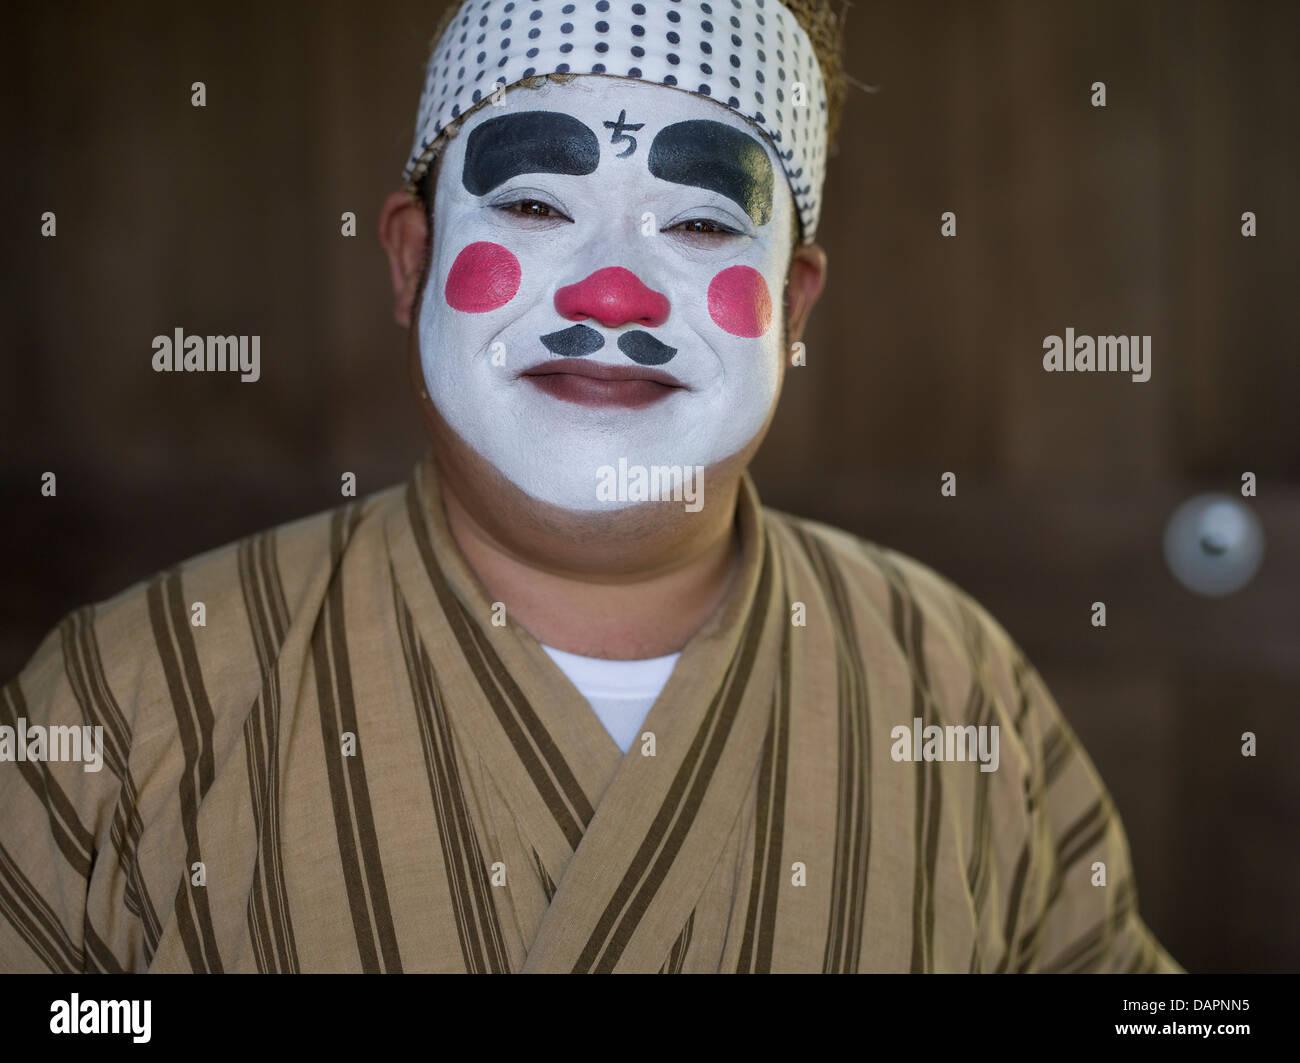 Chondara, Okinawan clown, at Ryukyu Mura, Okinawa, Japan - Stock Image